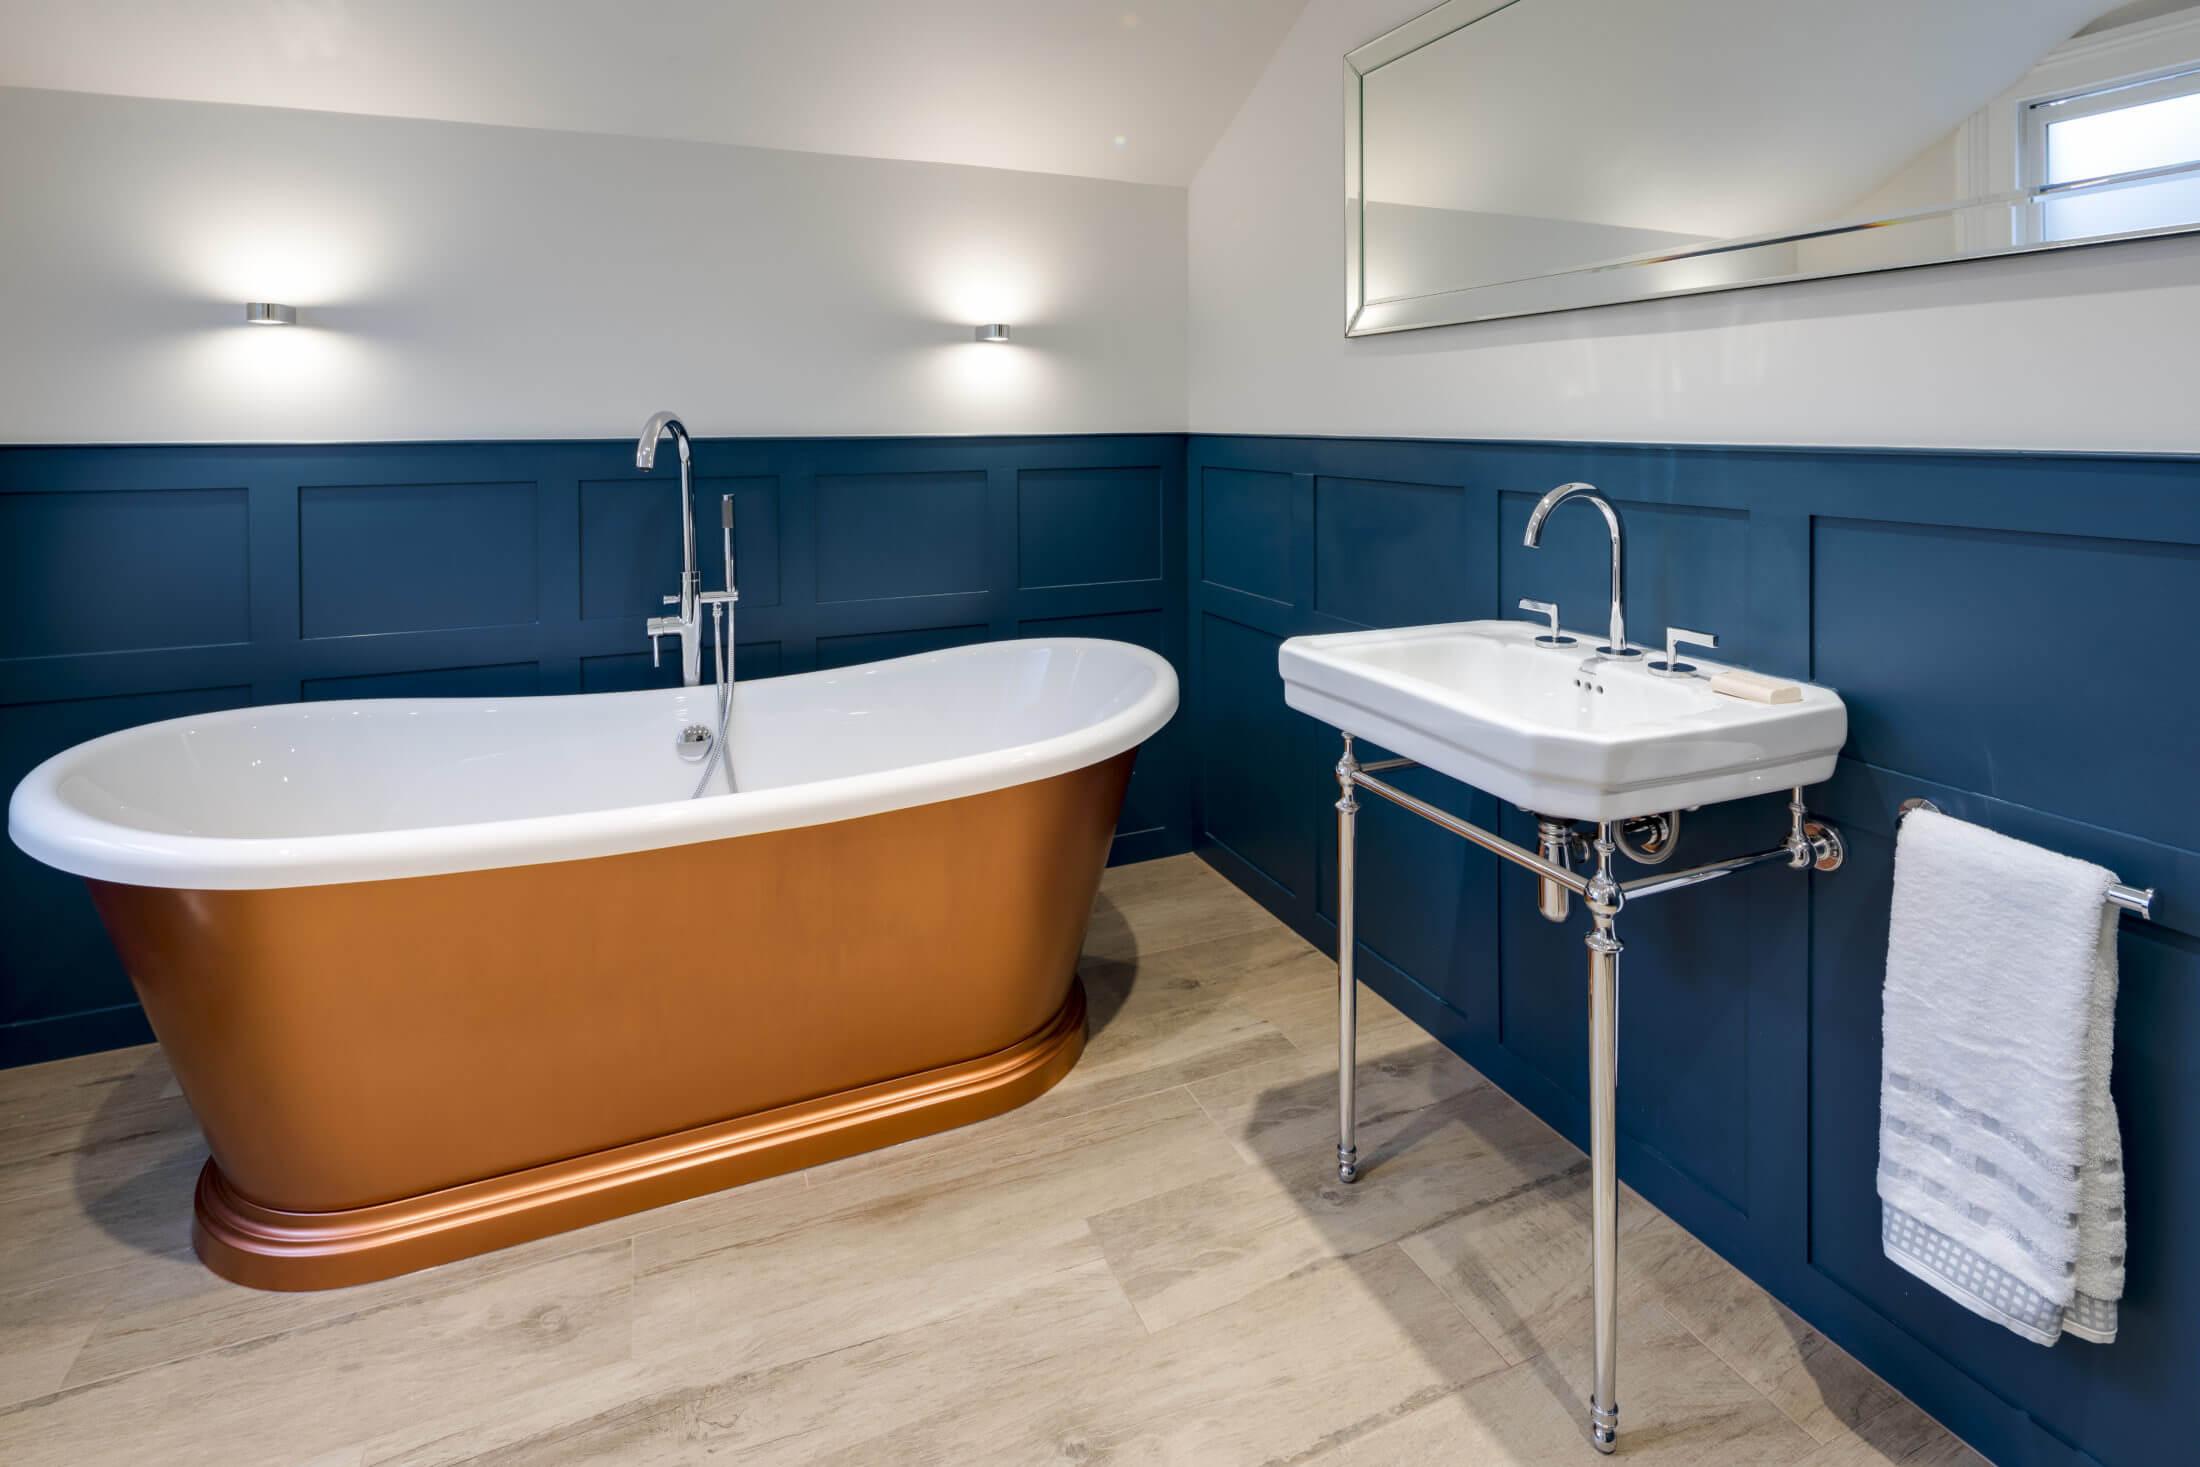 Bathroom Eleven - Panel bathroom